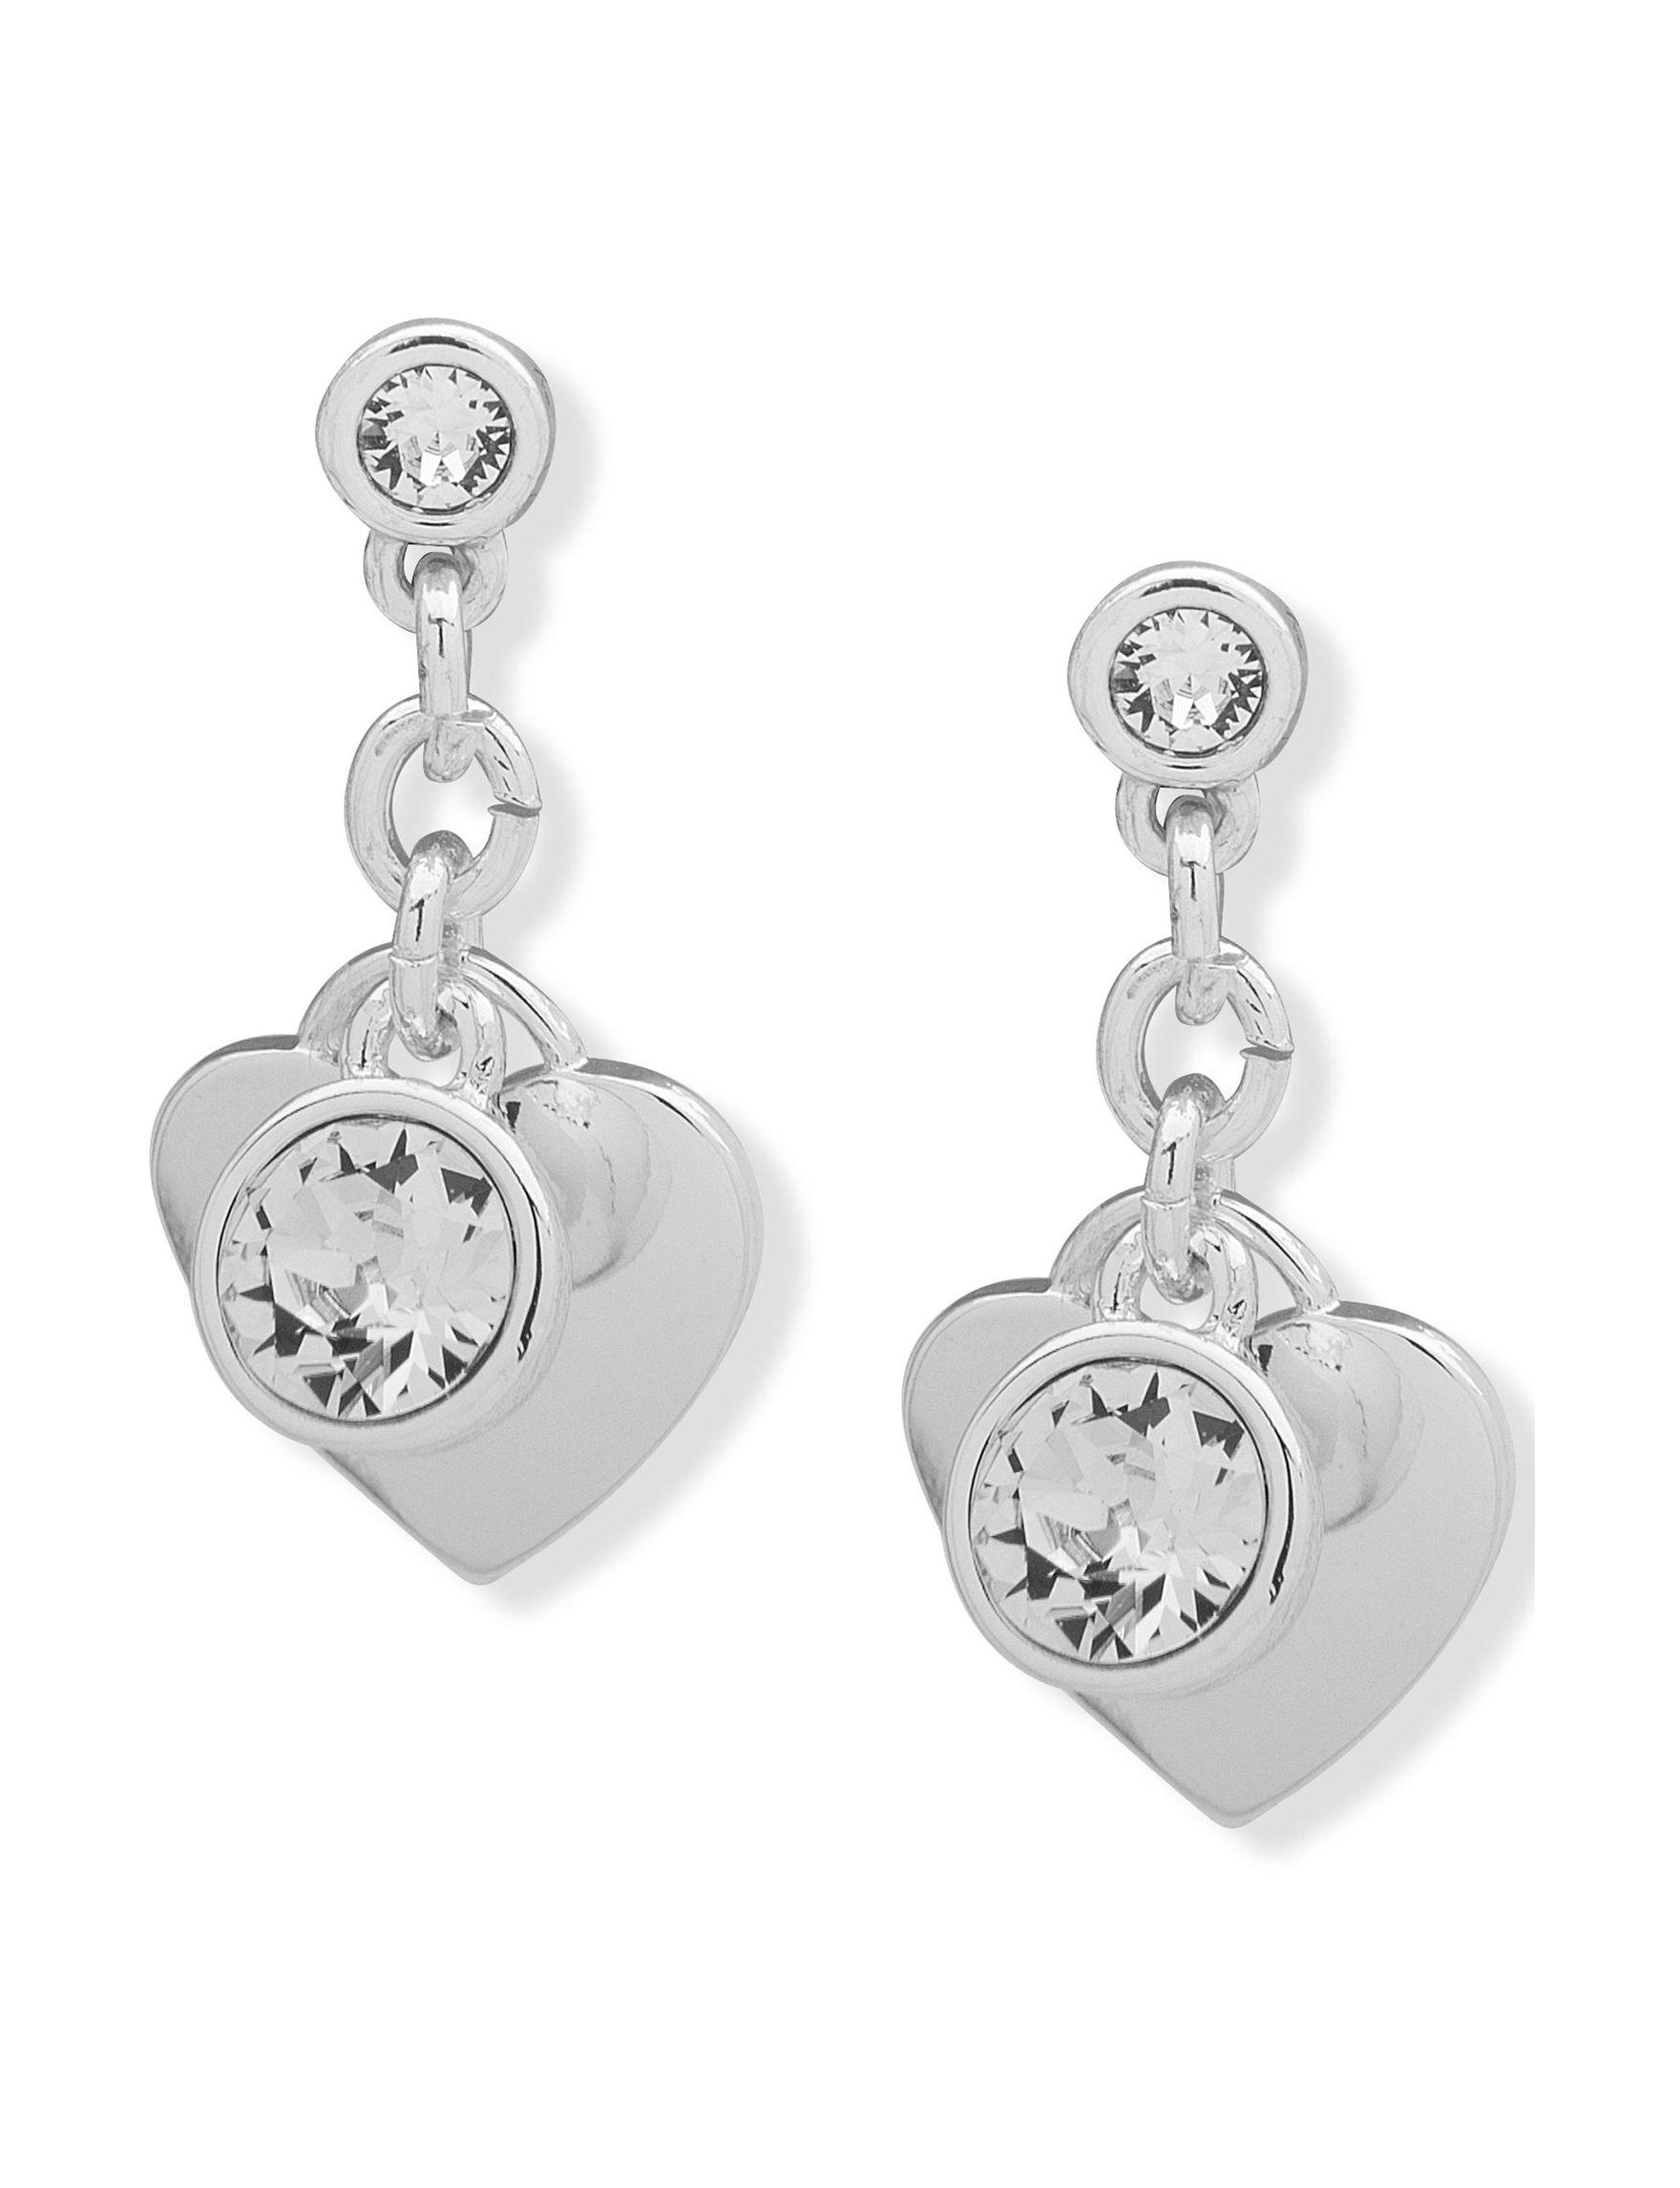 Gloria Vanderbilt Silver / Crystal Drops Fashion Jewelry